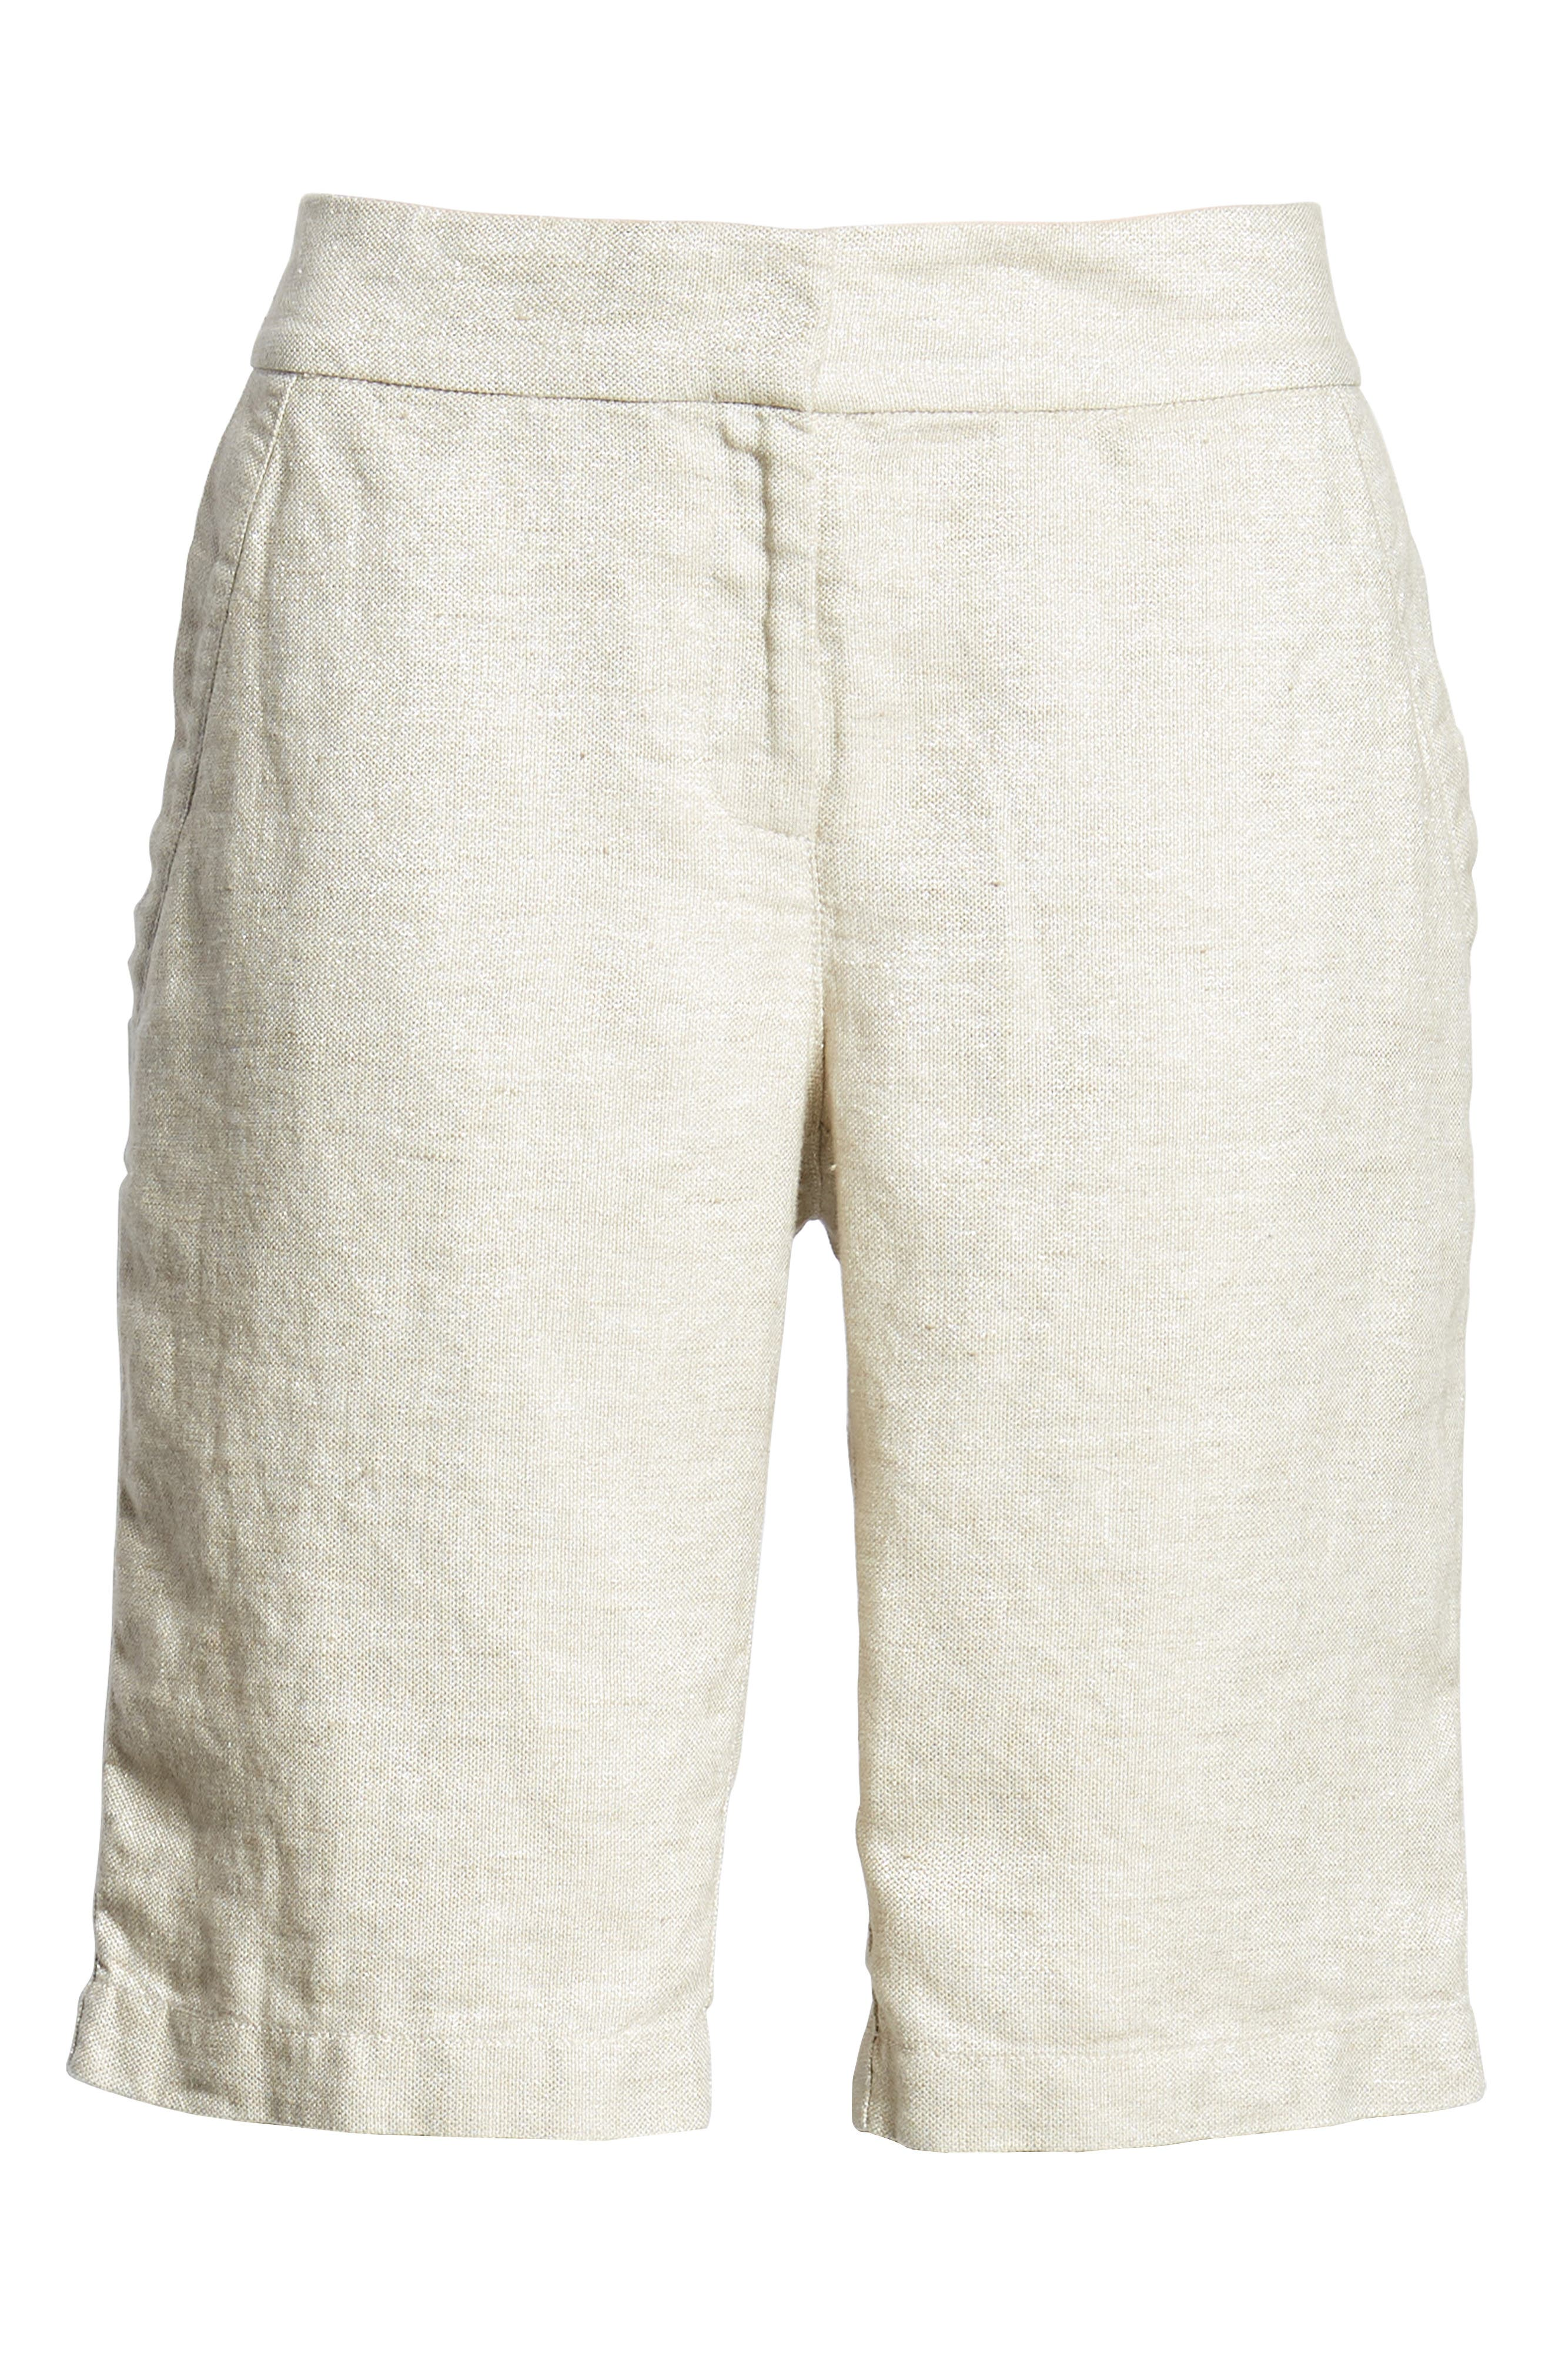 Organic Linen Blend Walking Shorts,                             Alternate thumbnail 6, color,                             Natural